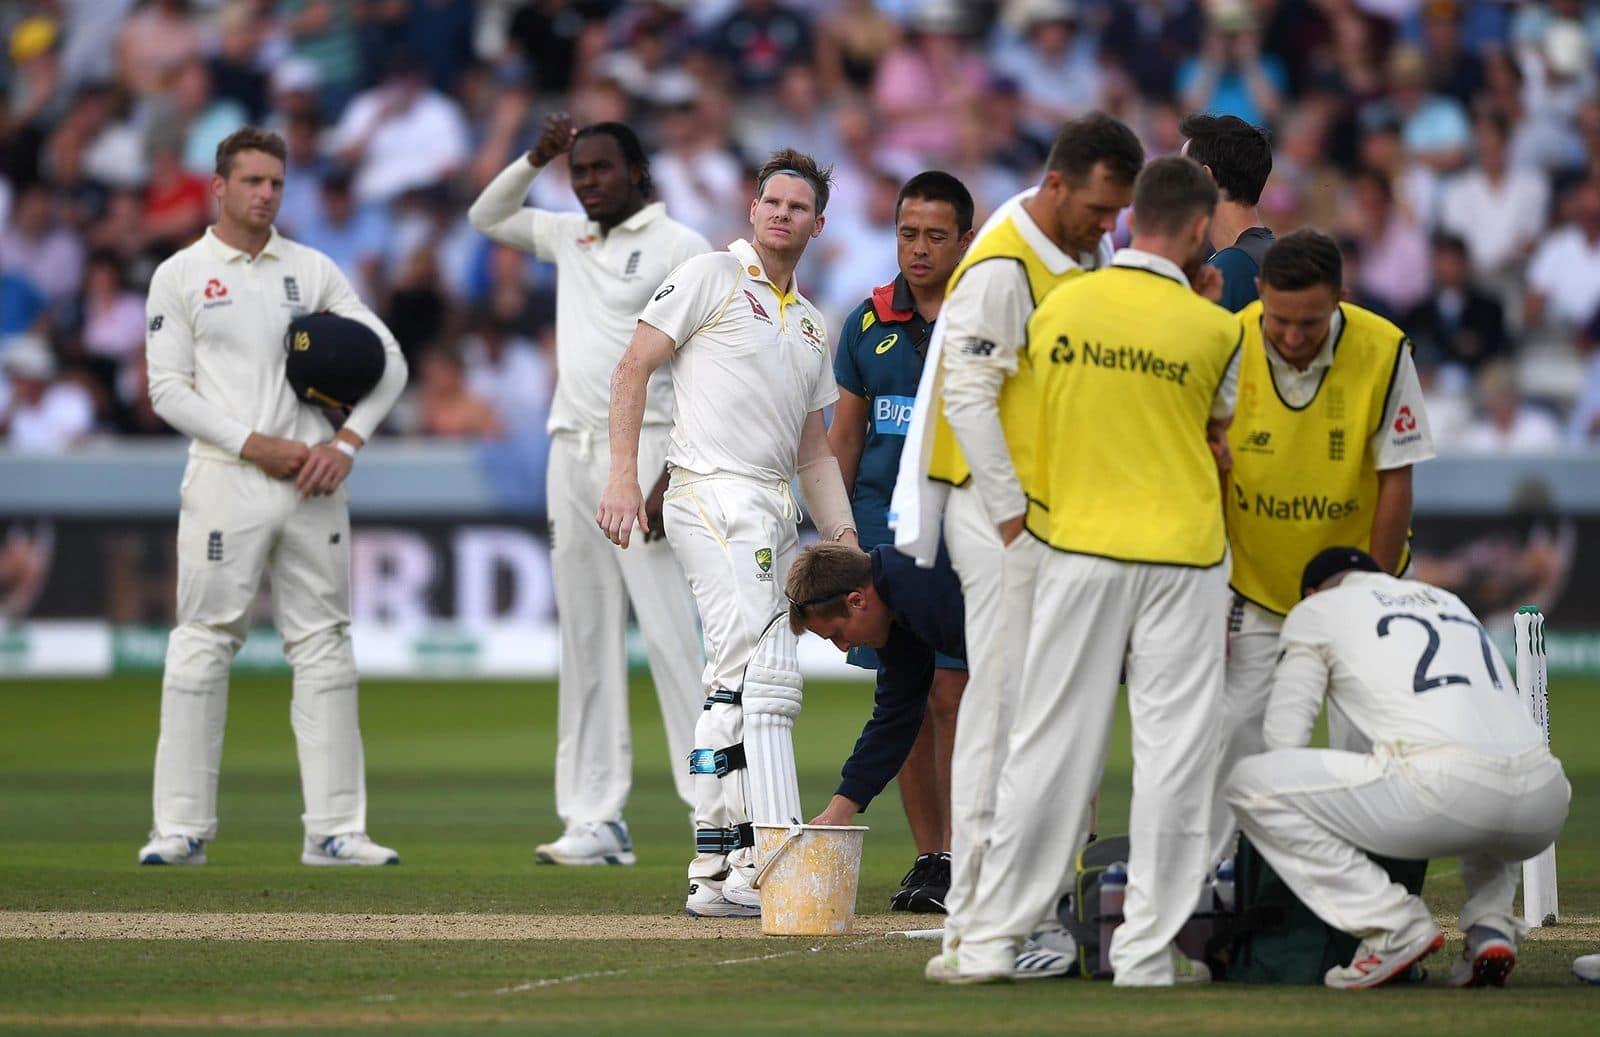 Steve Smith injury update: Australia batsman 'back to his old self' says Test vice-captain Travis Head